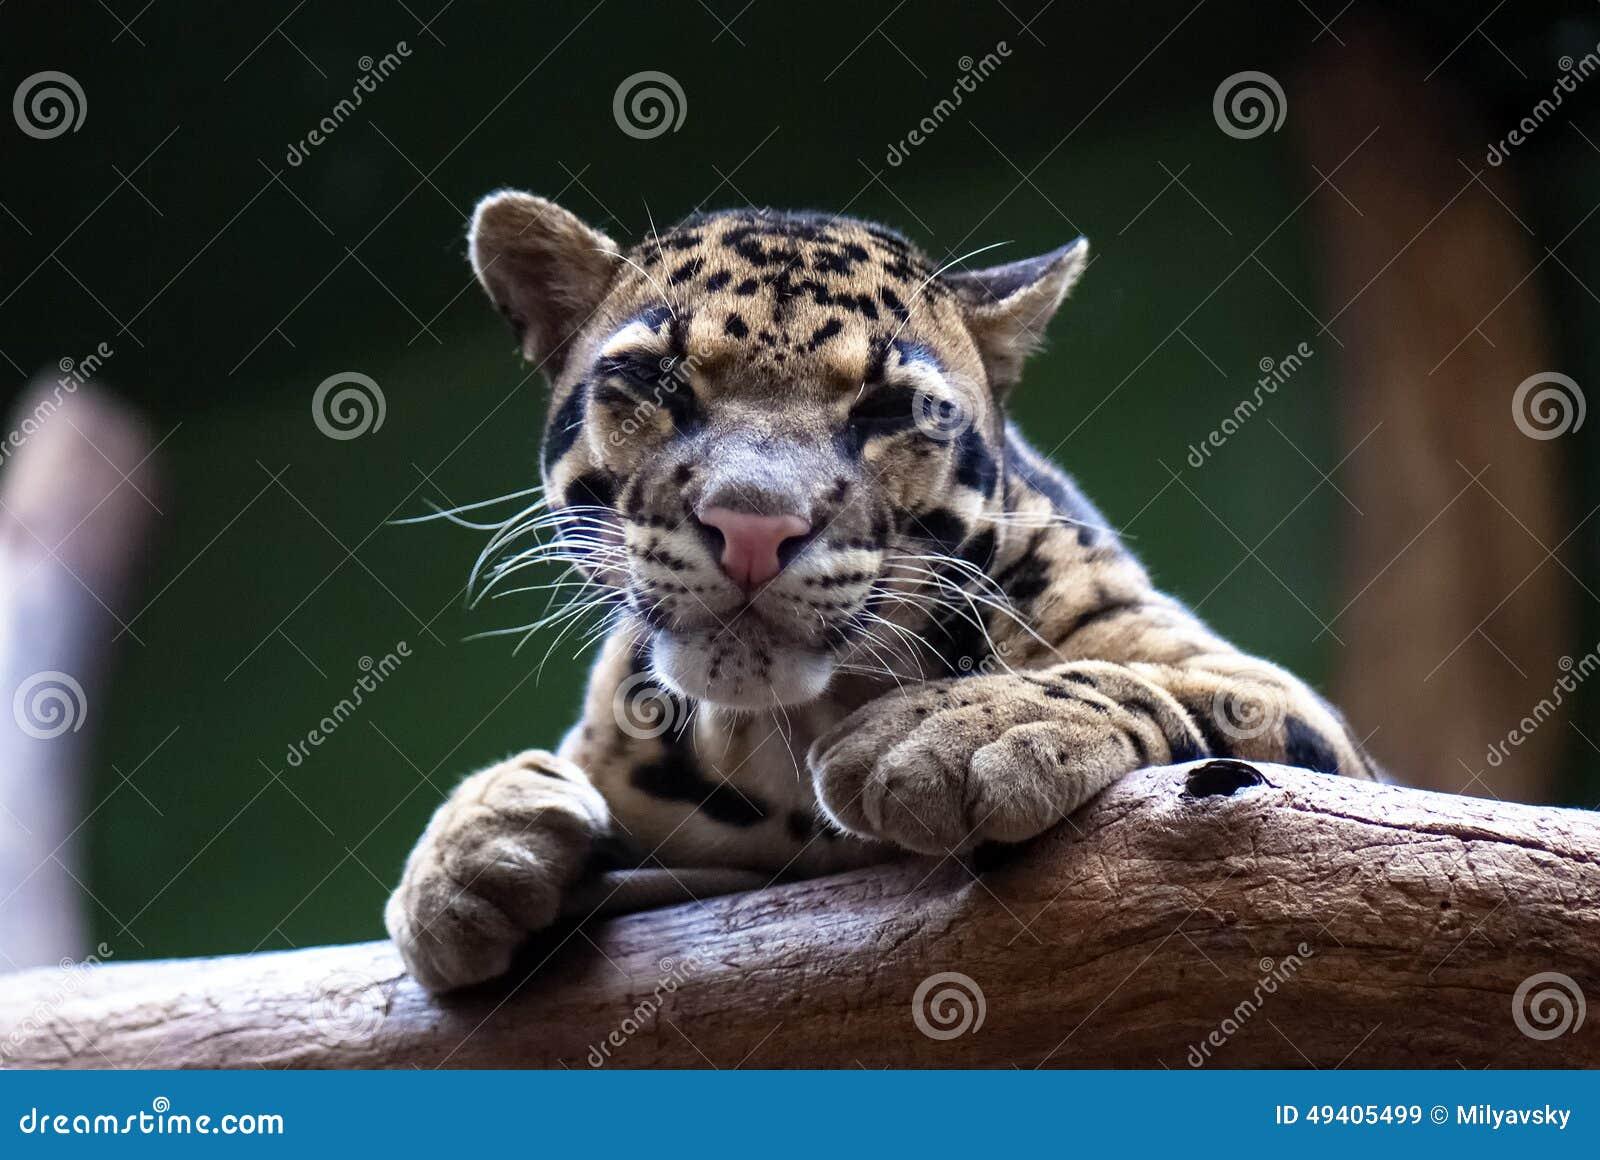 Download Bewölkter Leopard stockbild. Bild von ausdrucksvoll, geschöpf - 49405499